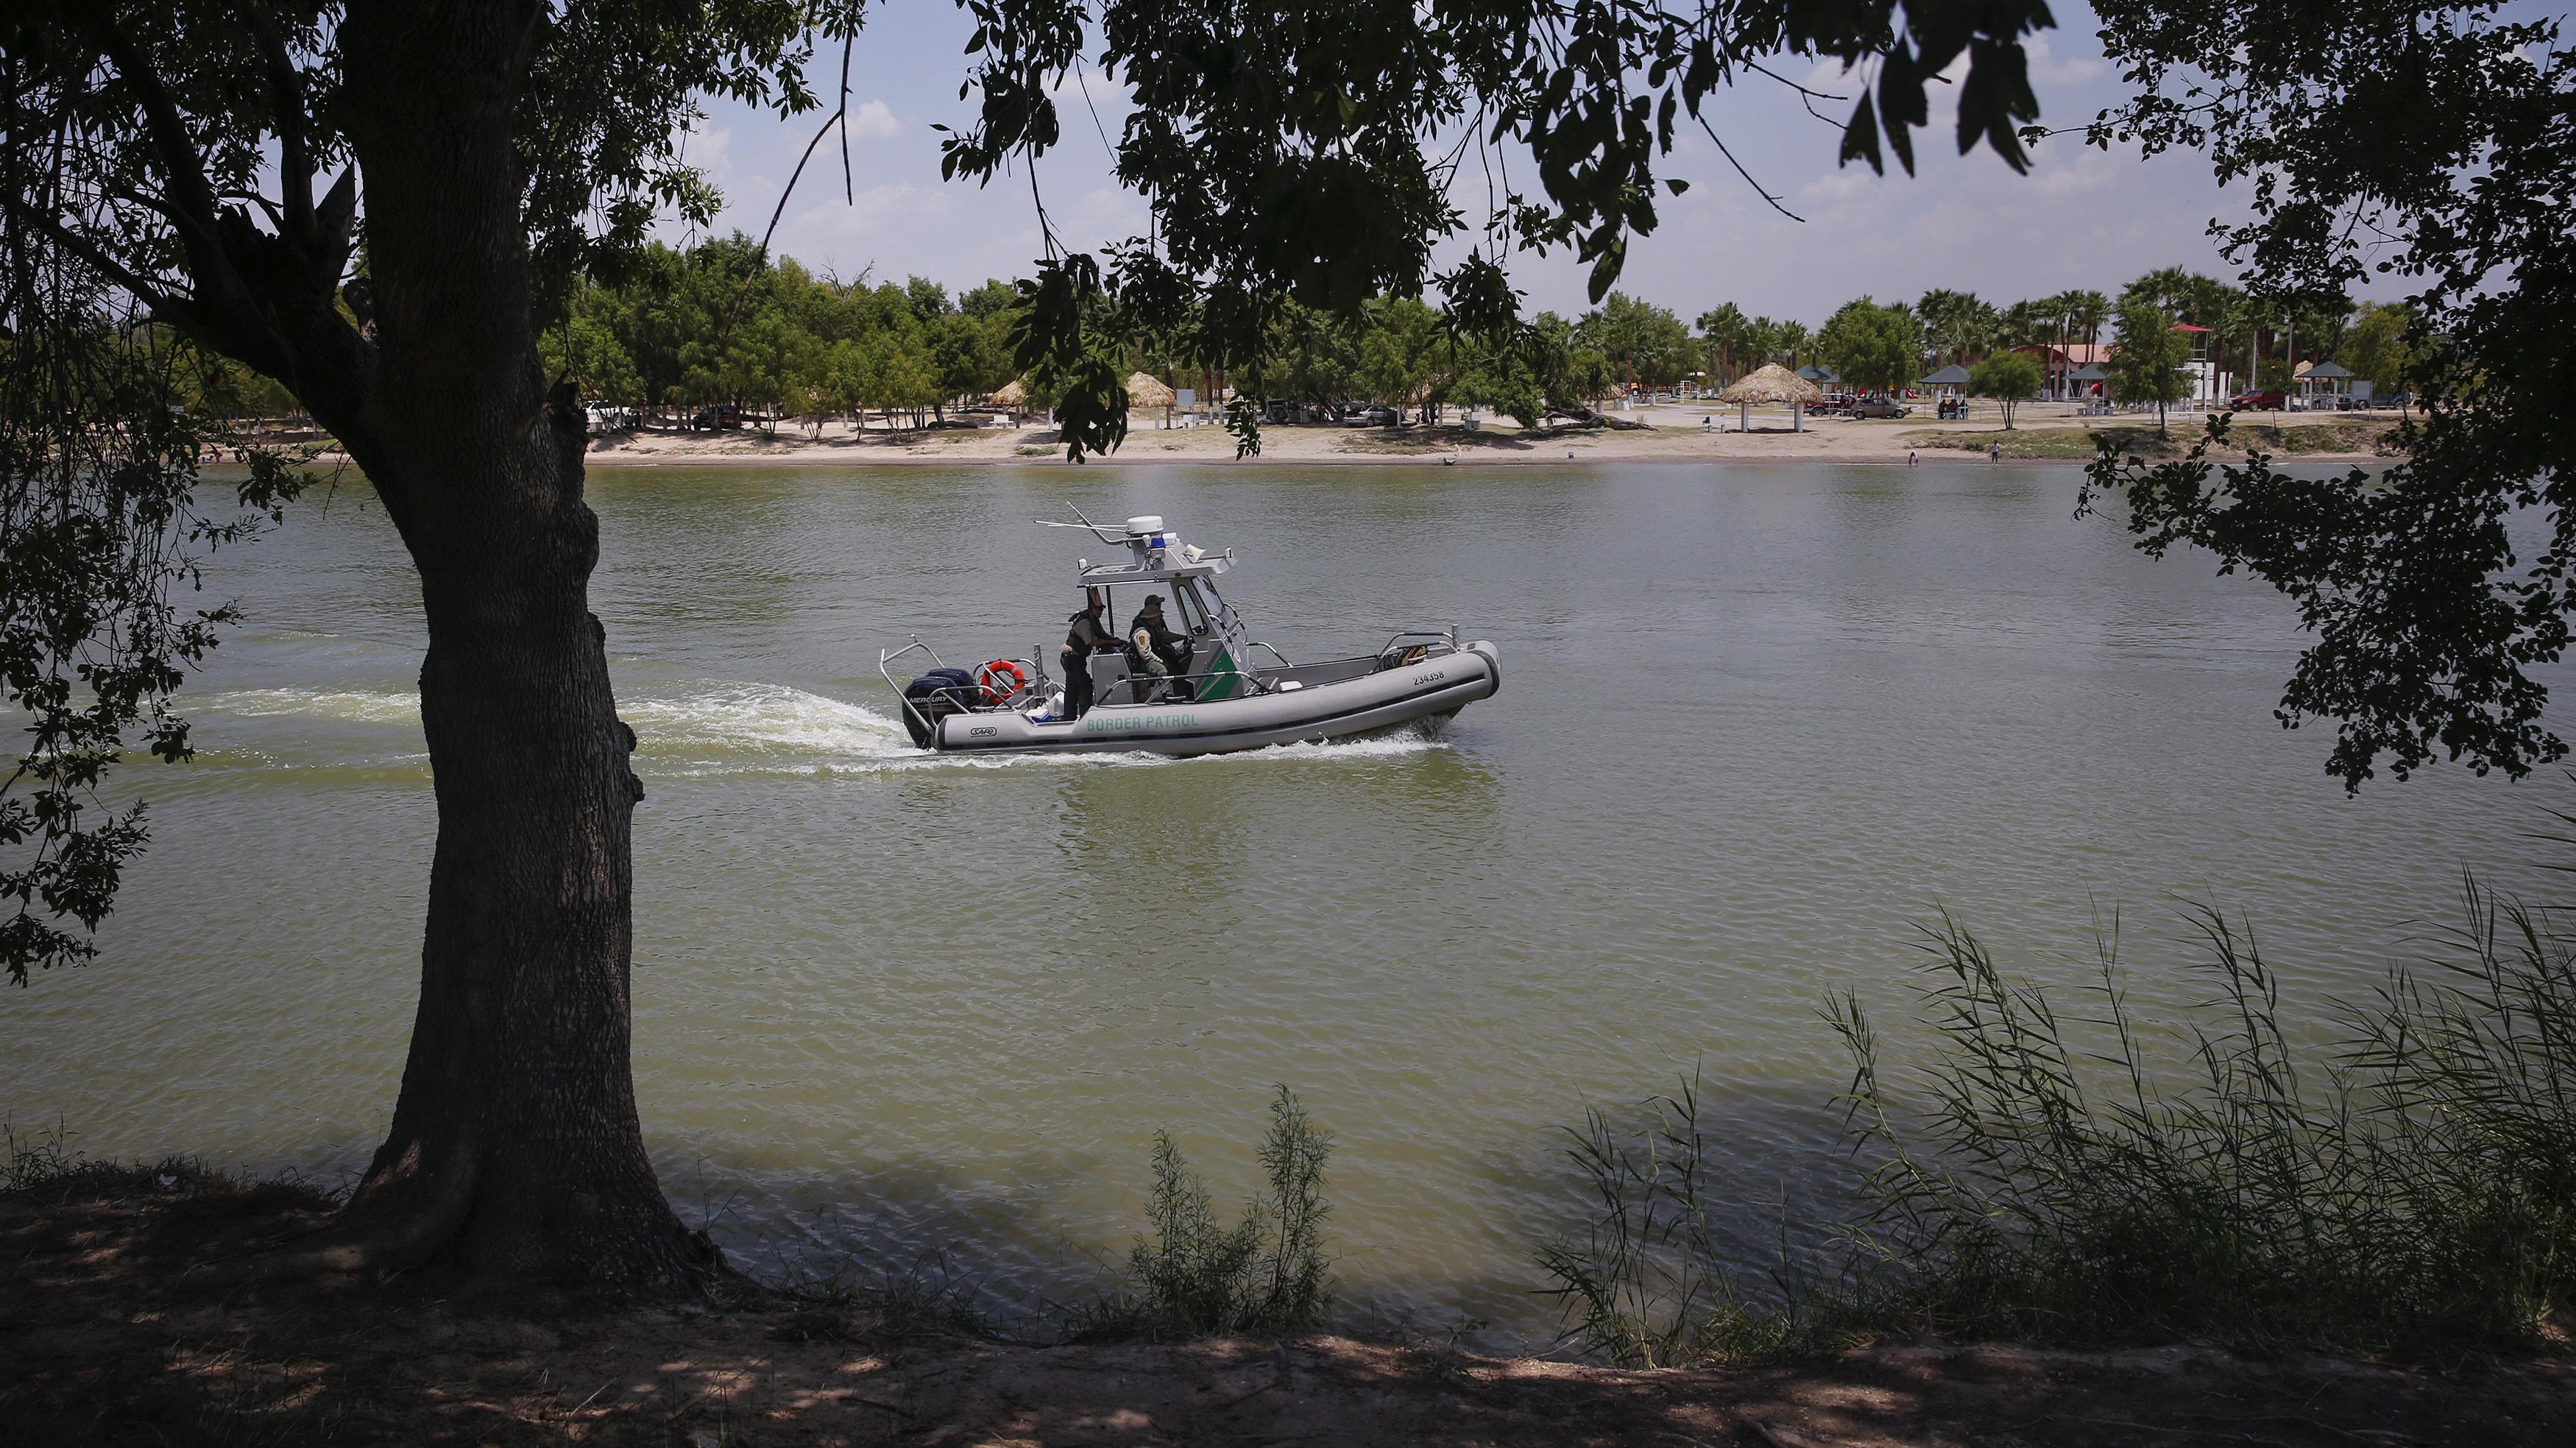 U.S. Border Patrol Finds 4 Bodies, Including 3 Children, Near Rio Grande In Texas